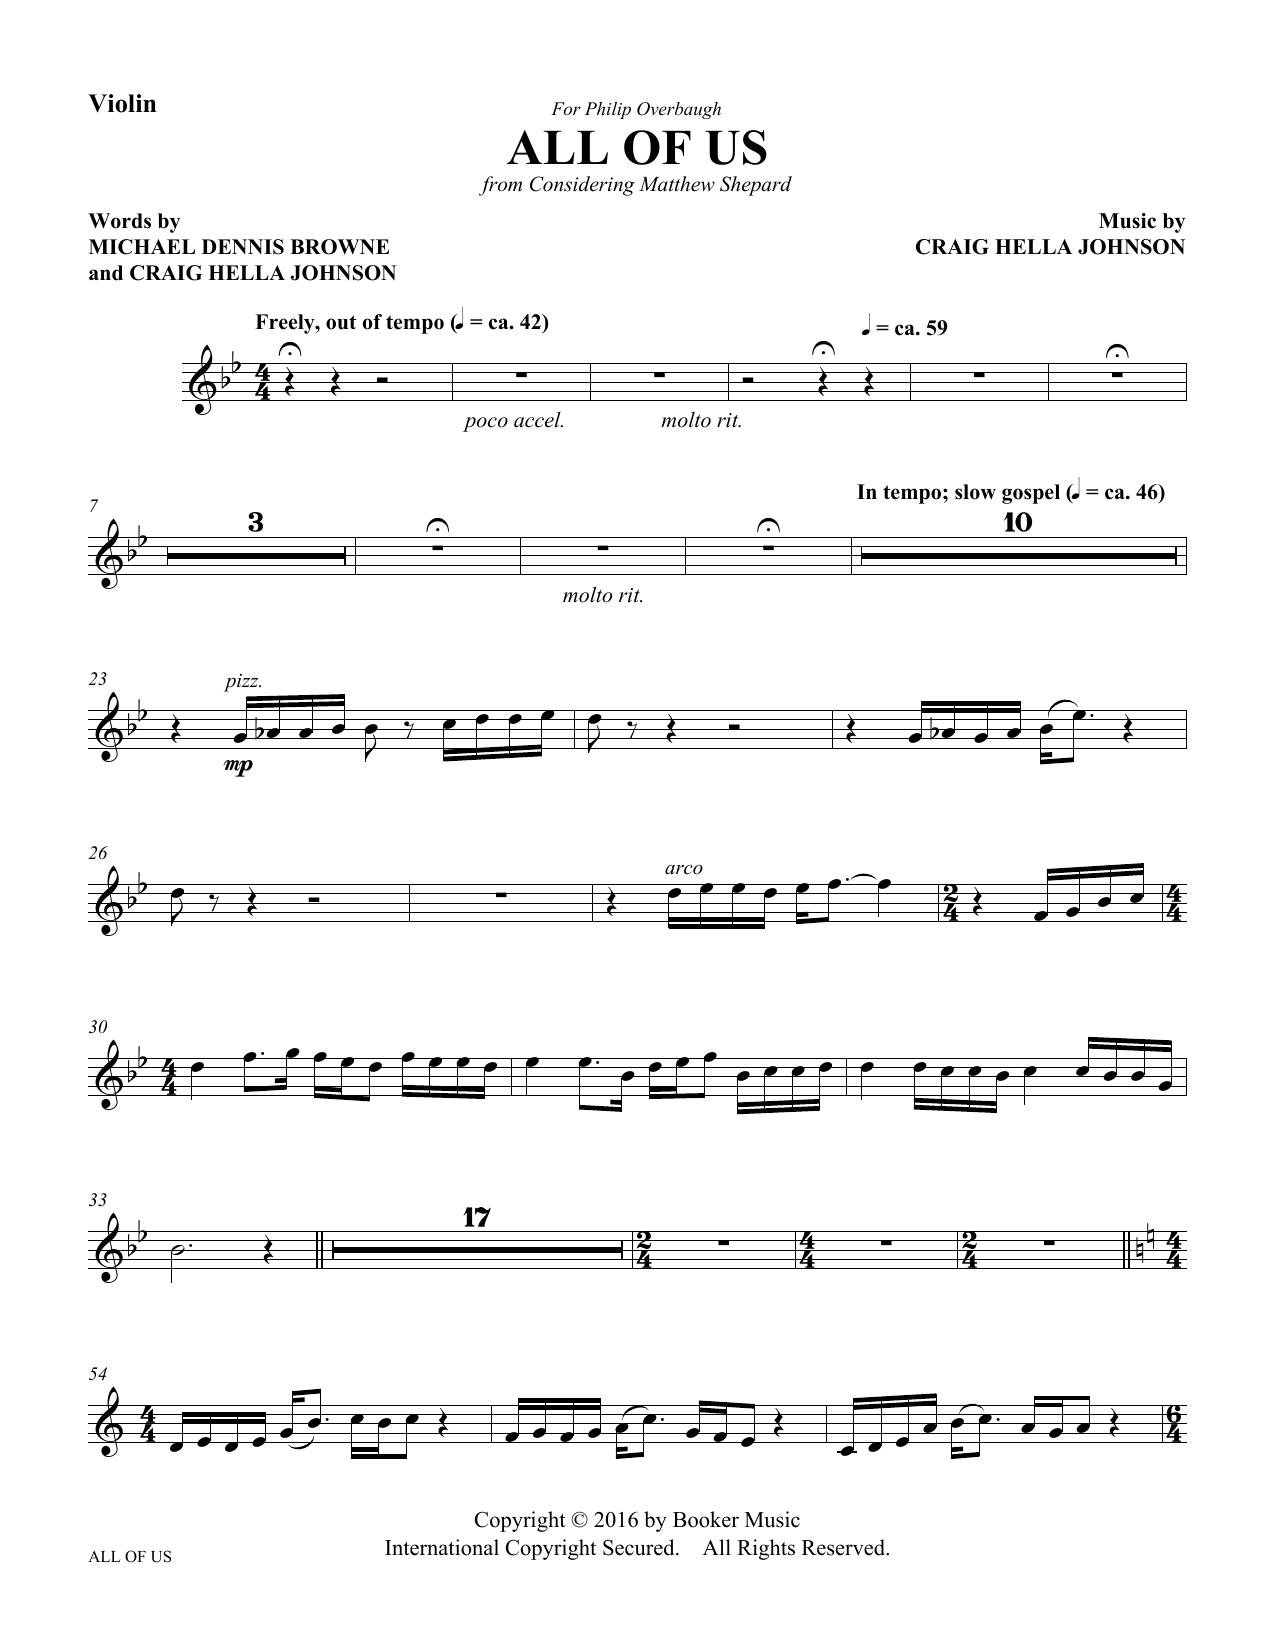 All of Us - Violin